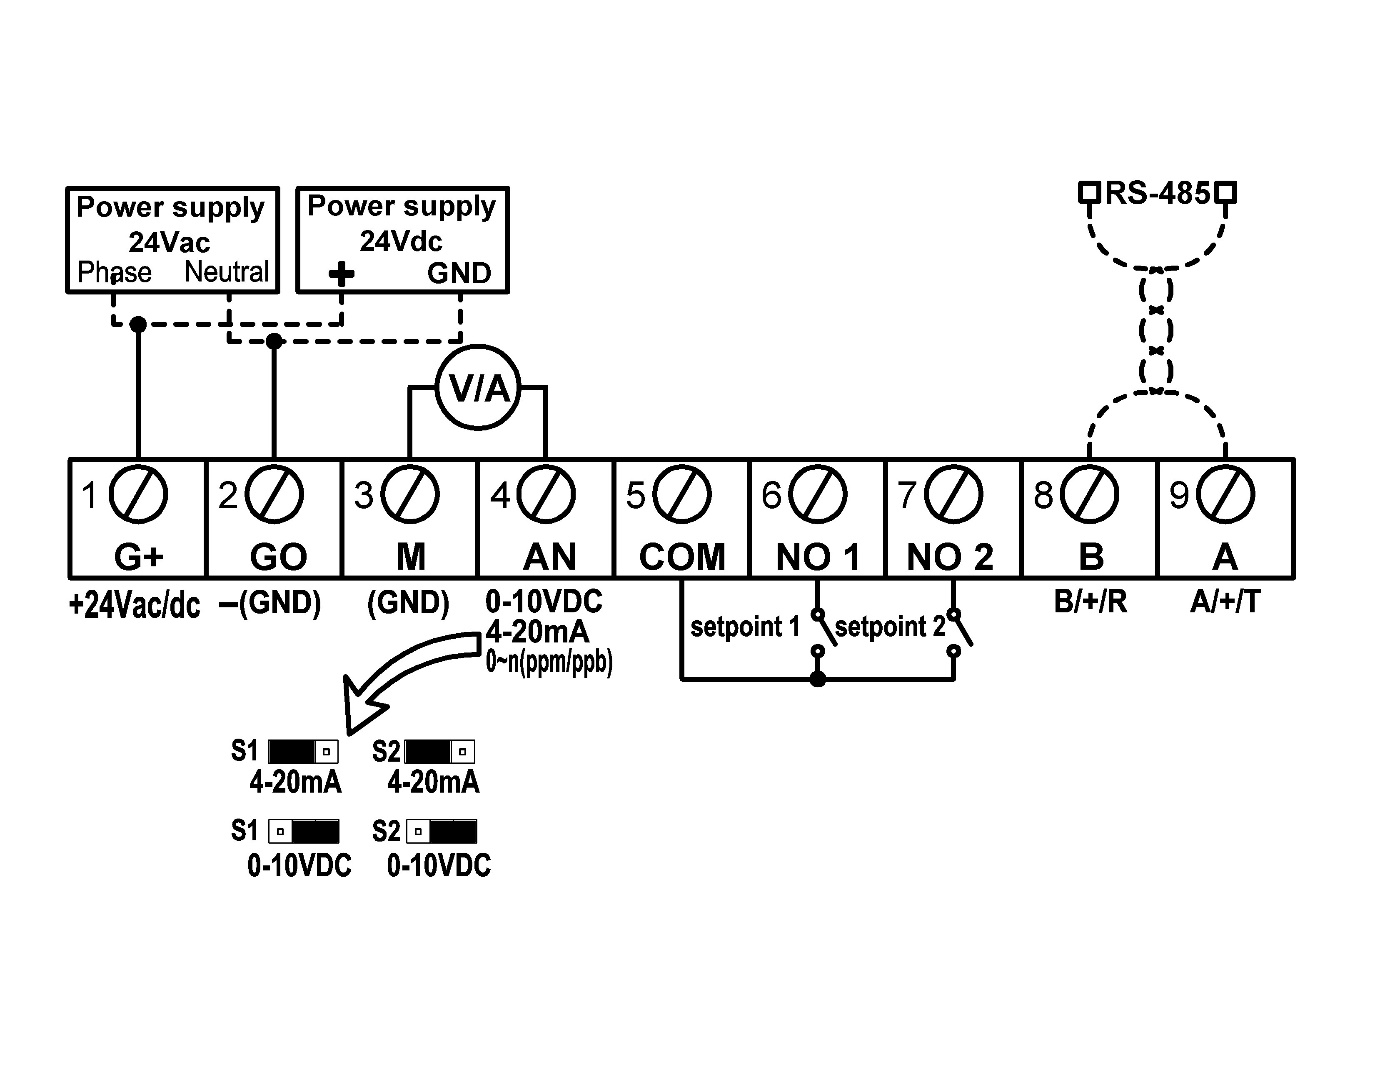 Dotech Sensing Control 10vdc Wiring Diagram Connection